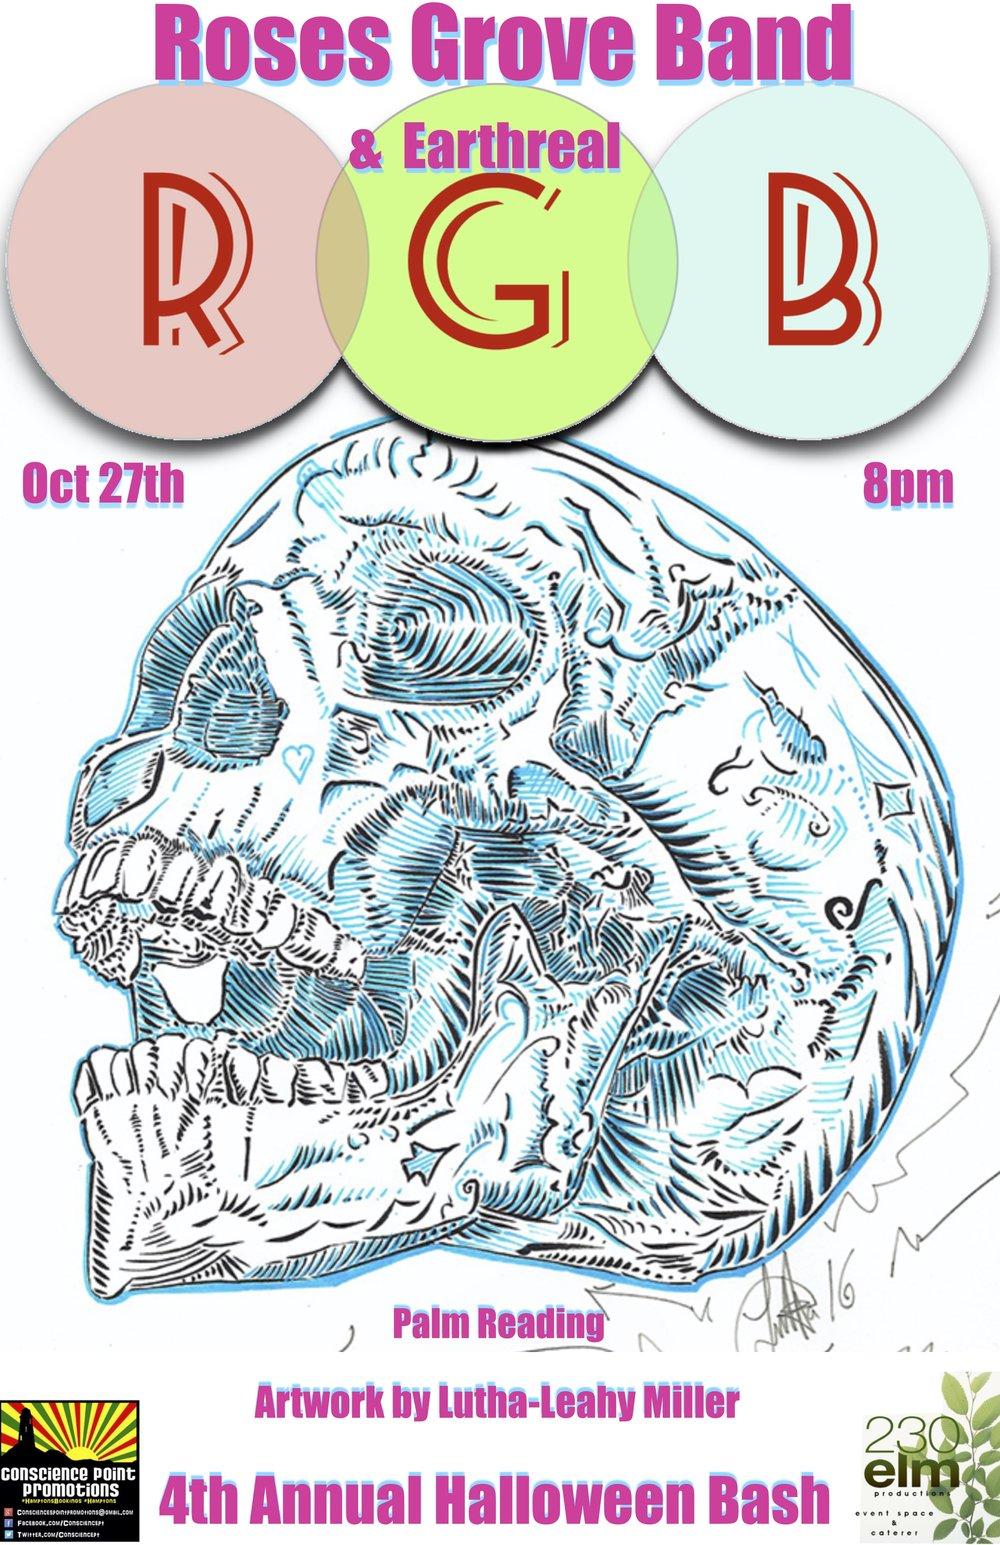 Roses Grove Poster 4th Annual Hallowen Bash .jpg